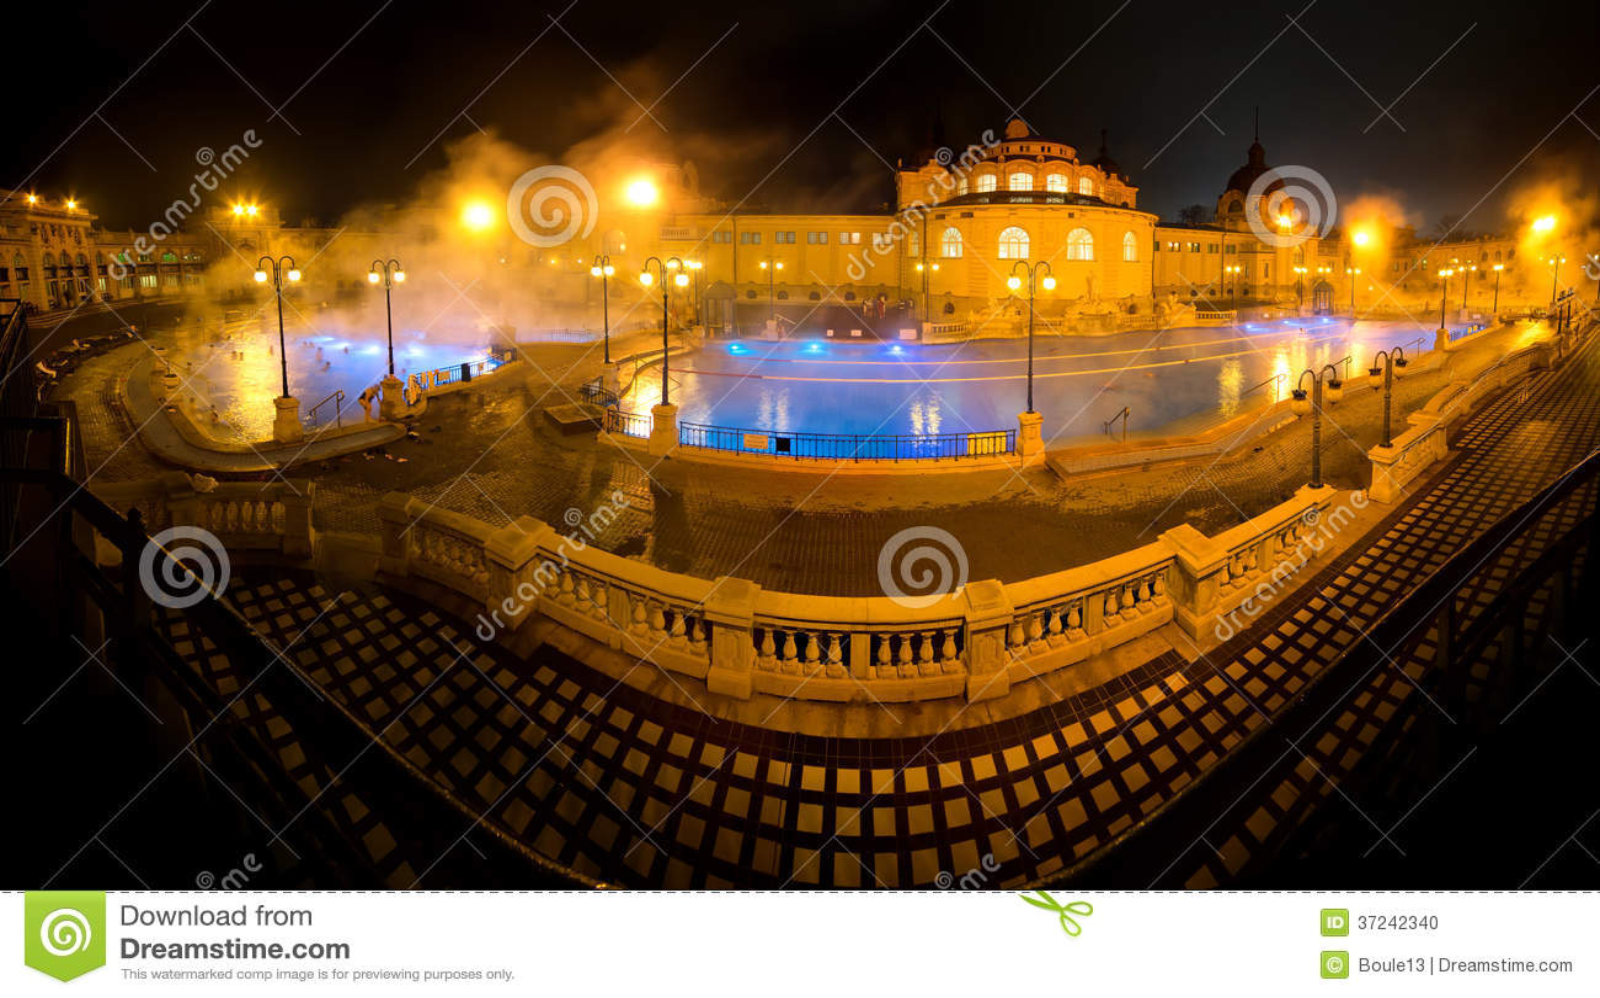 bagni termali szechenyi bagno della stazione termale di szechenyi budapest ungheria